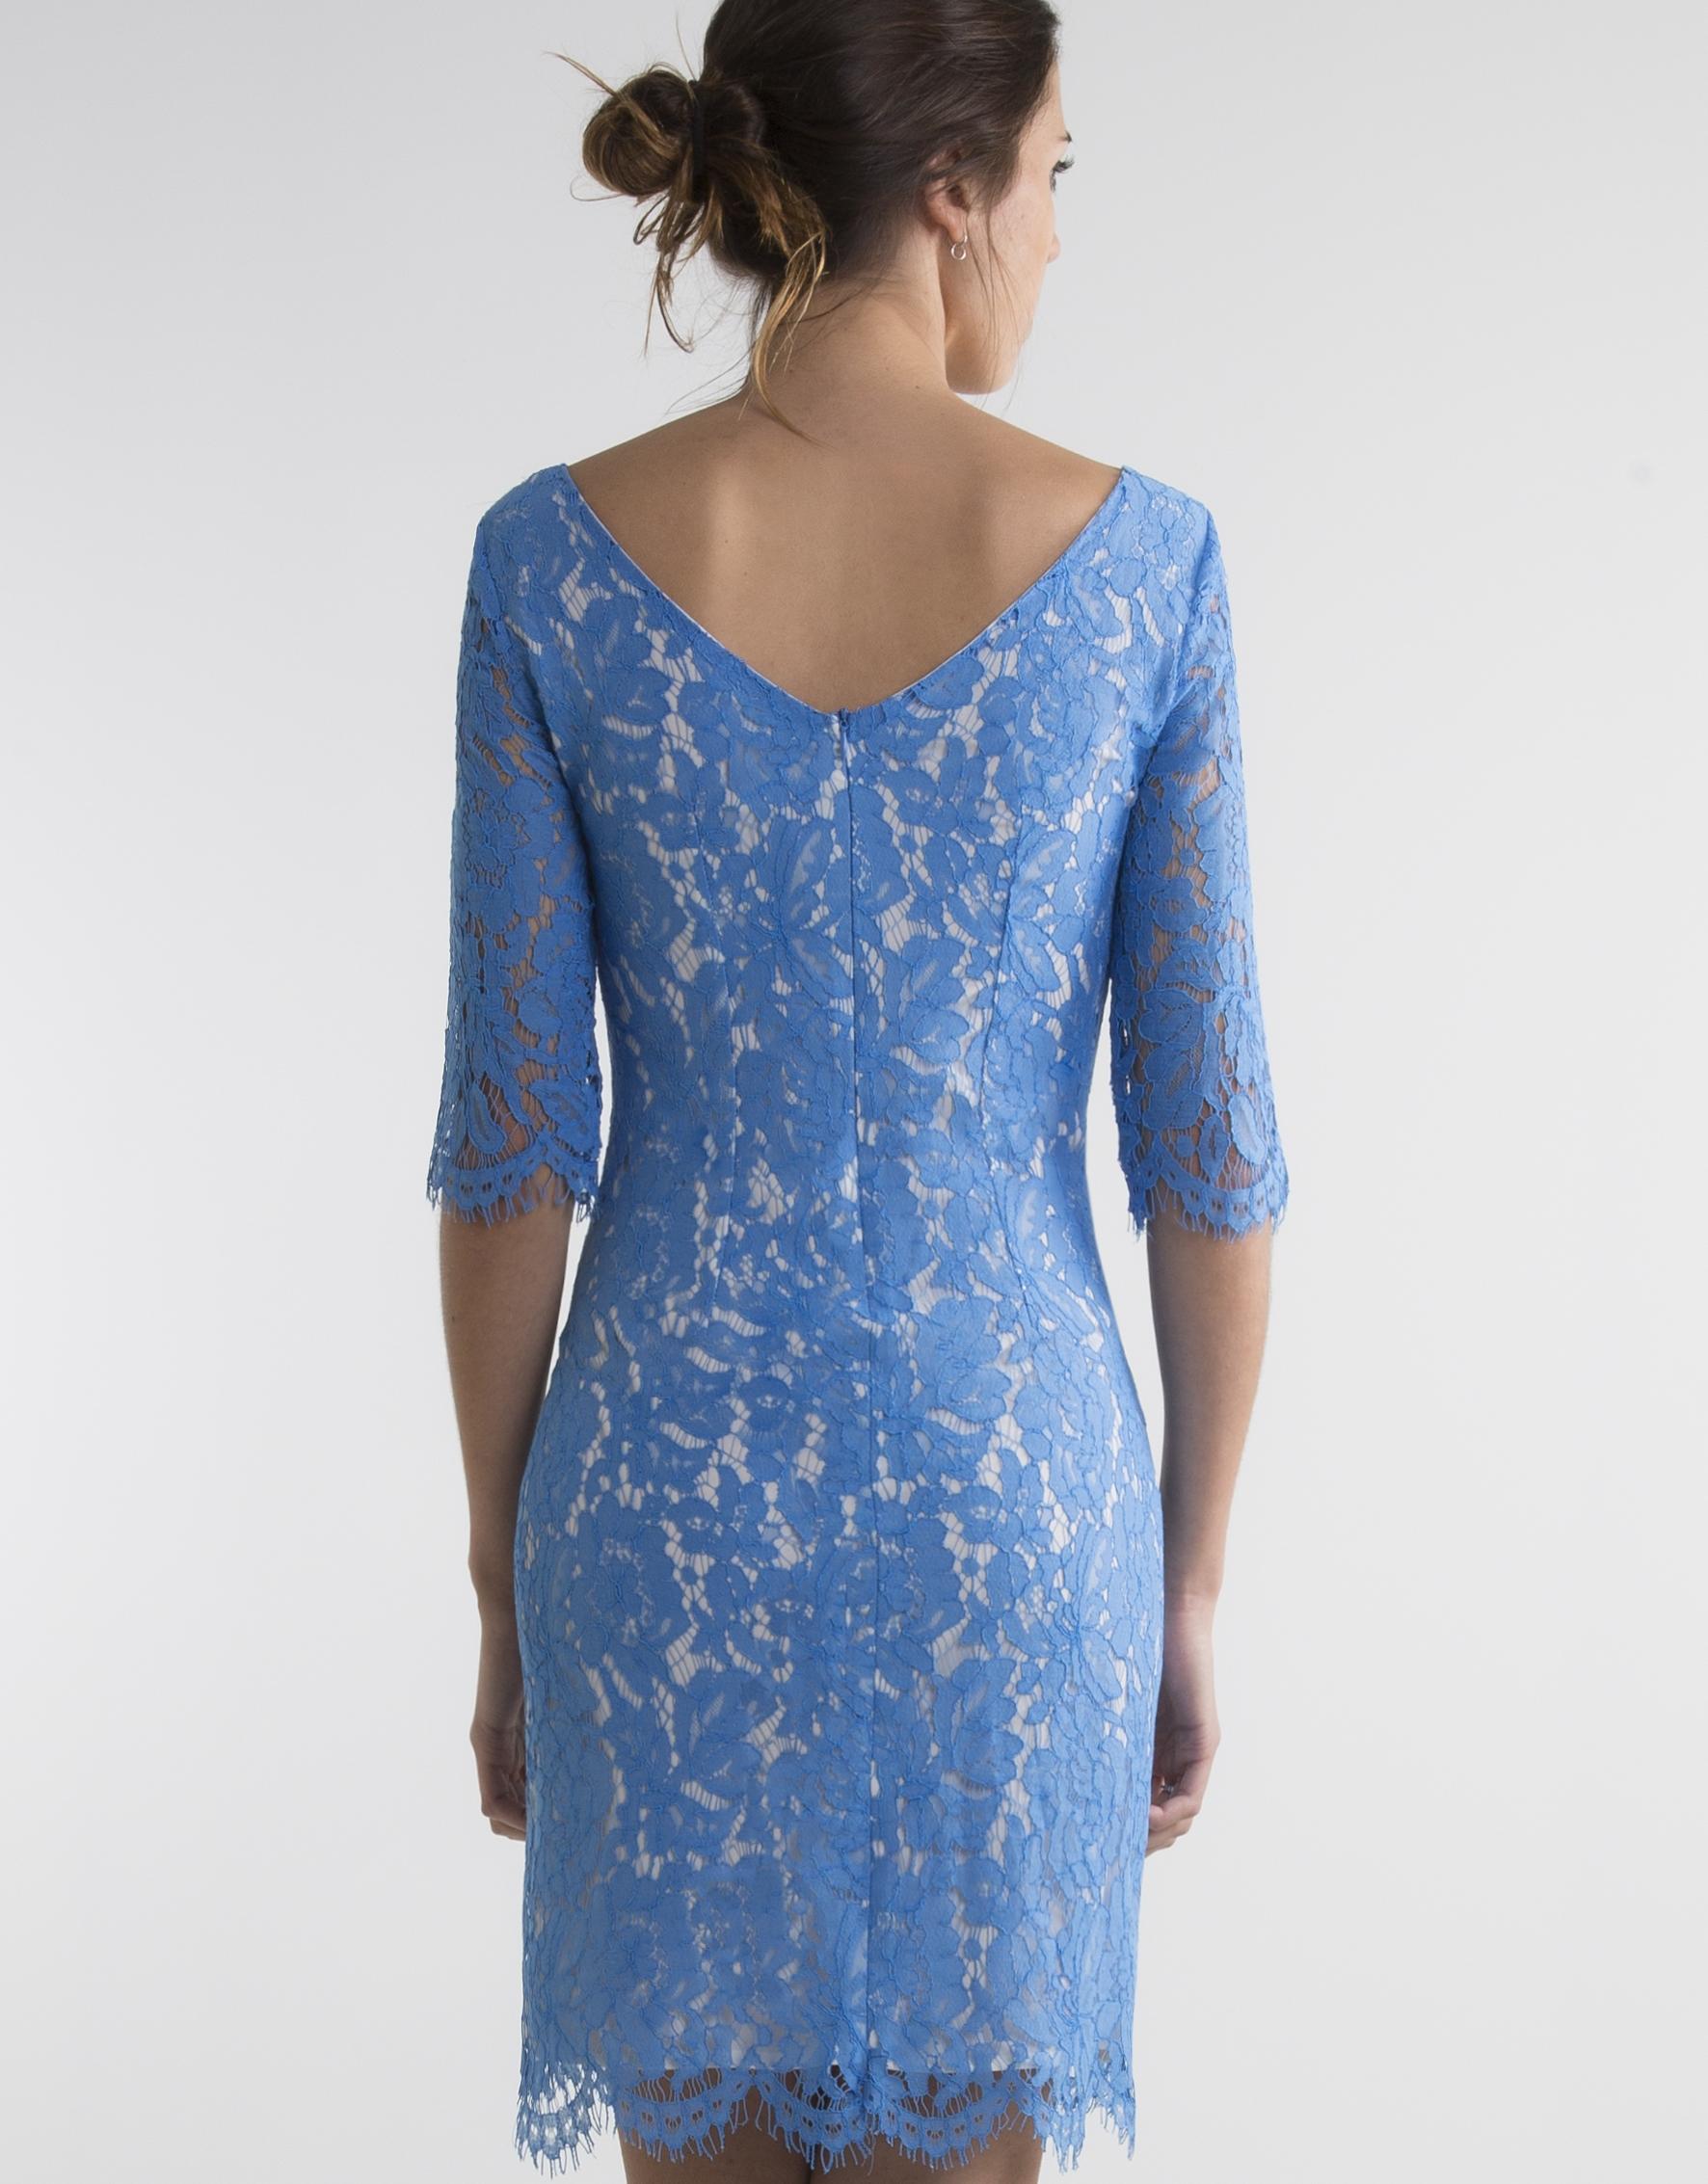 blue lace dress dresses woman roberto verino